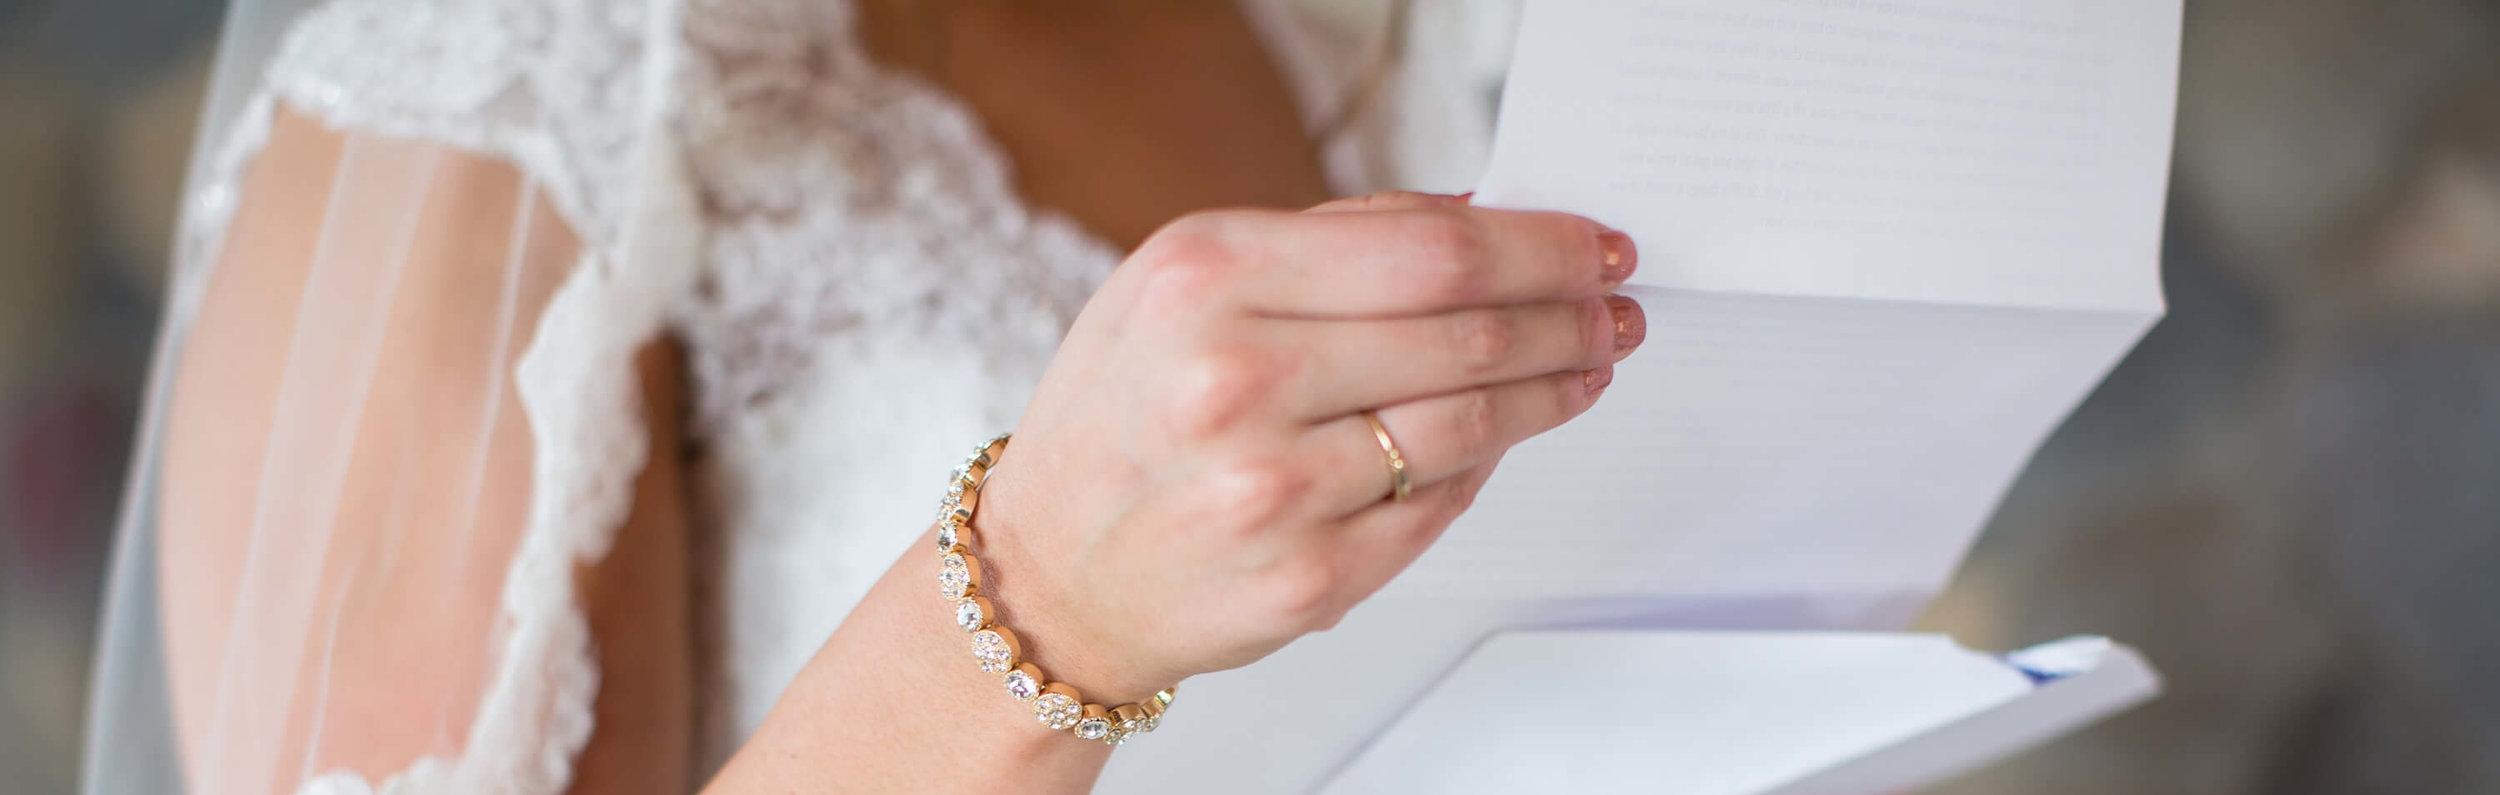 9Photographer: Nicki Lynn | Venue: Glenhave Wedding winter wedding | indoor ceremony.jpg